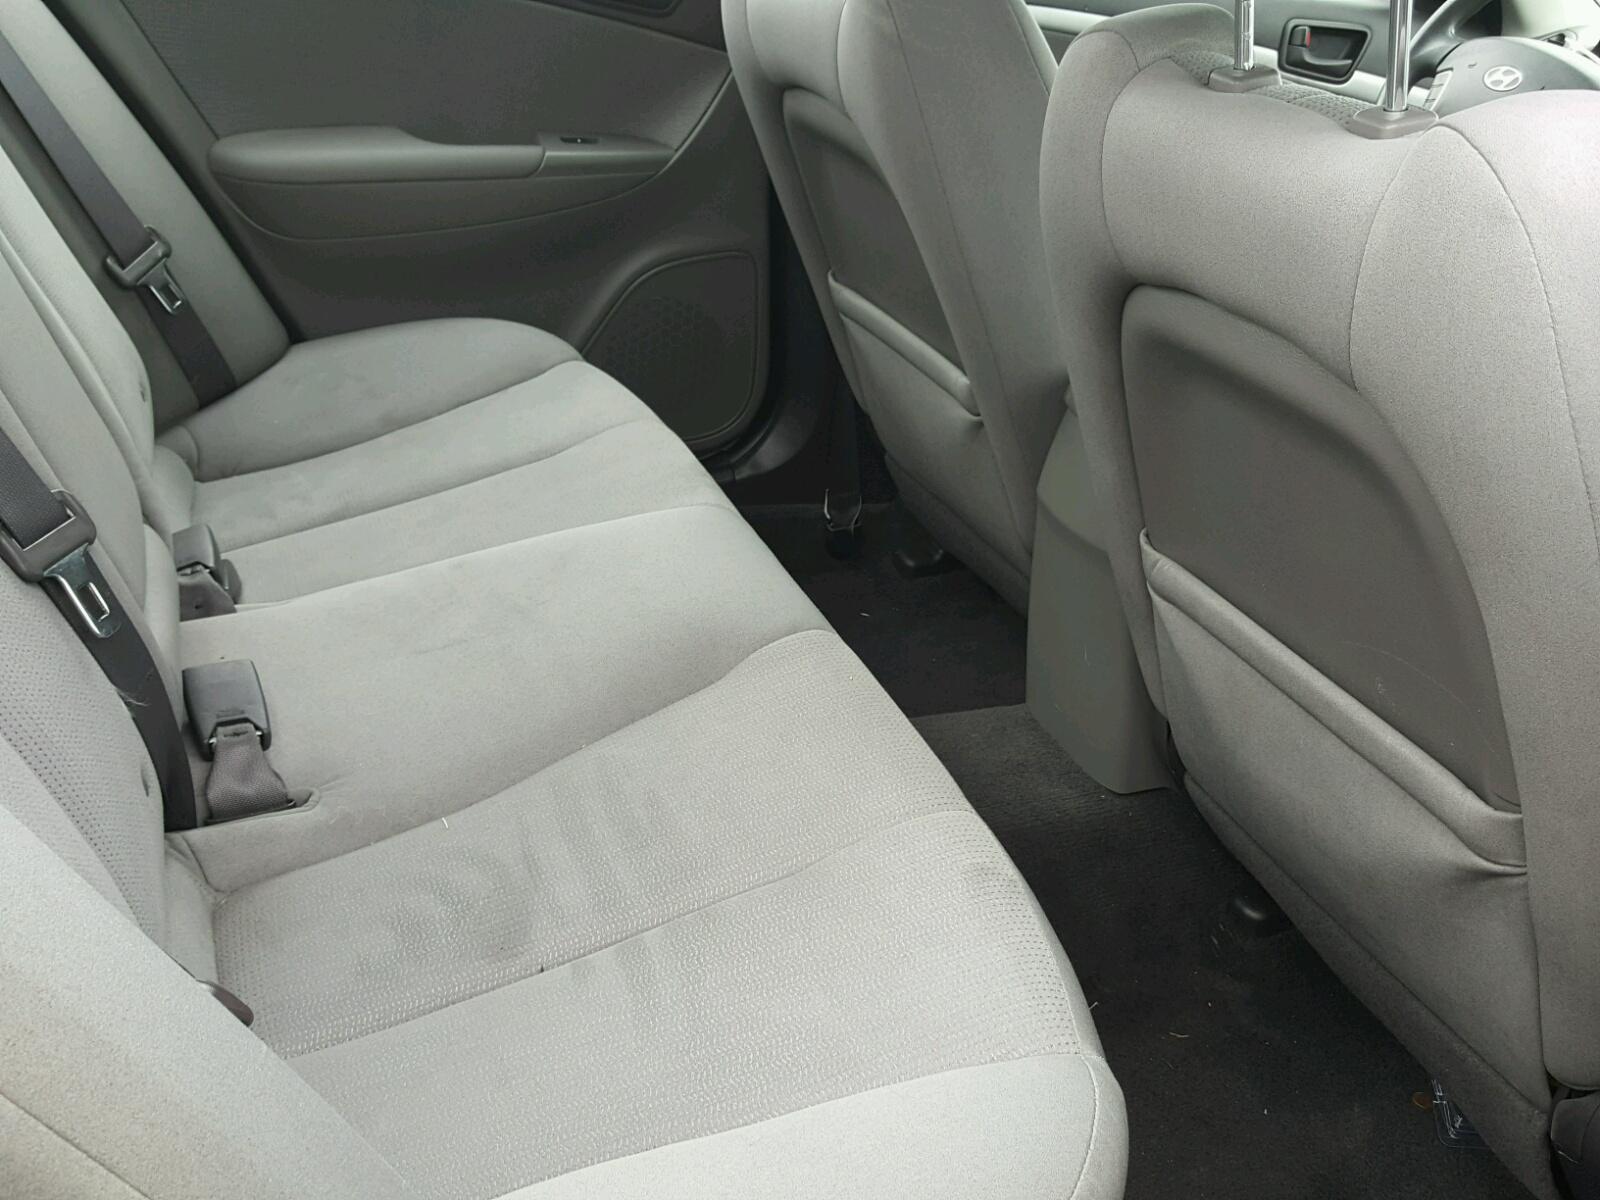 2009 Hyundai Sonata For Sale At Copart Finksburg Md Lot